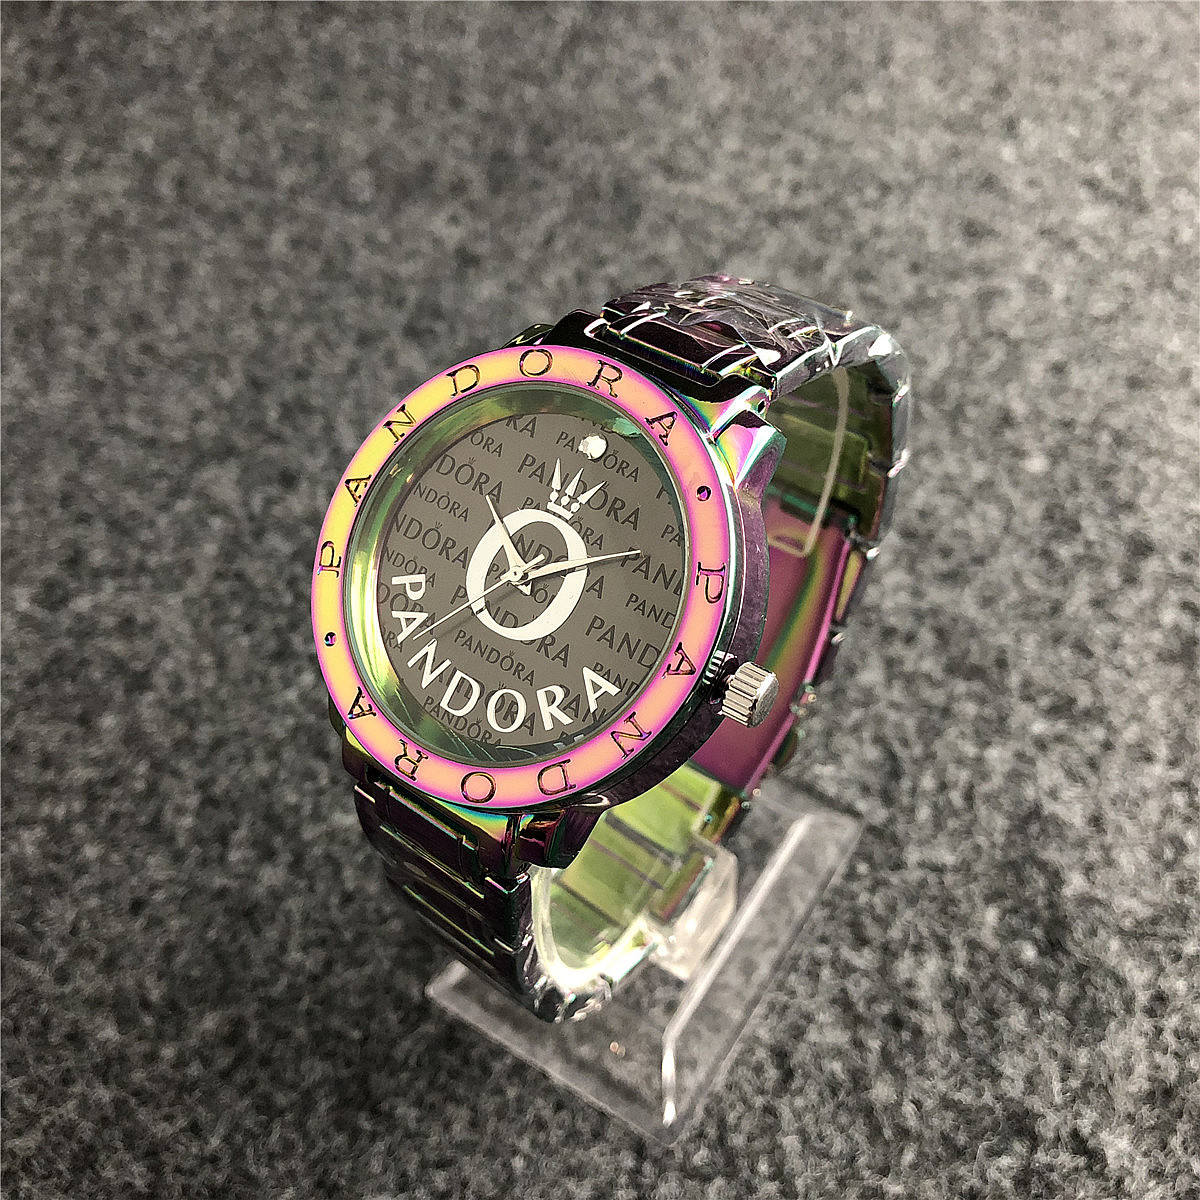 NEW Women Pandoraes Bracelet Charms Silver 925 Original Pandoraes Watch Luxury Ladies Watches For Women Reloj Mujer Saat Relogio